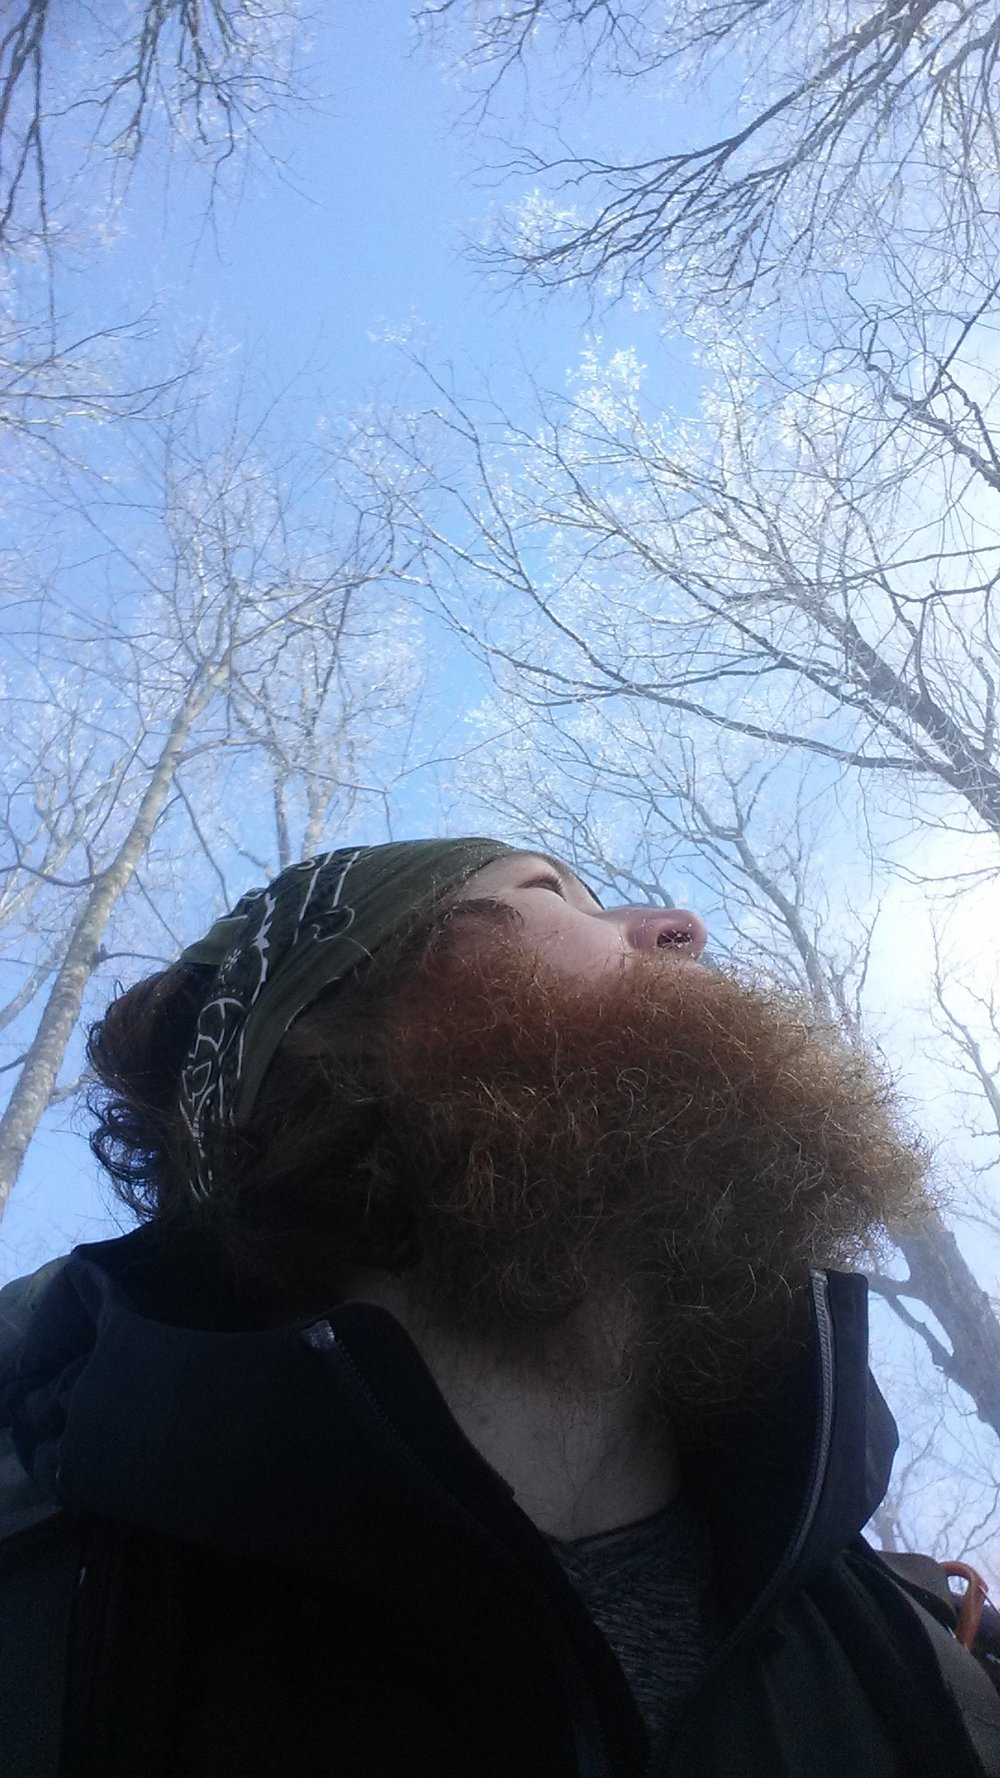 Beards are a wintertime necessity!